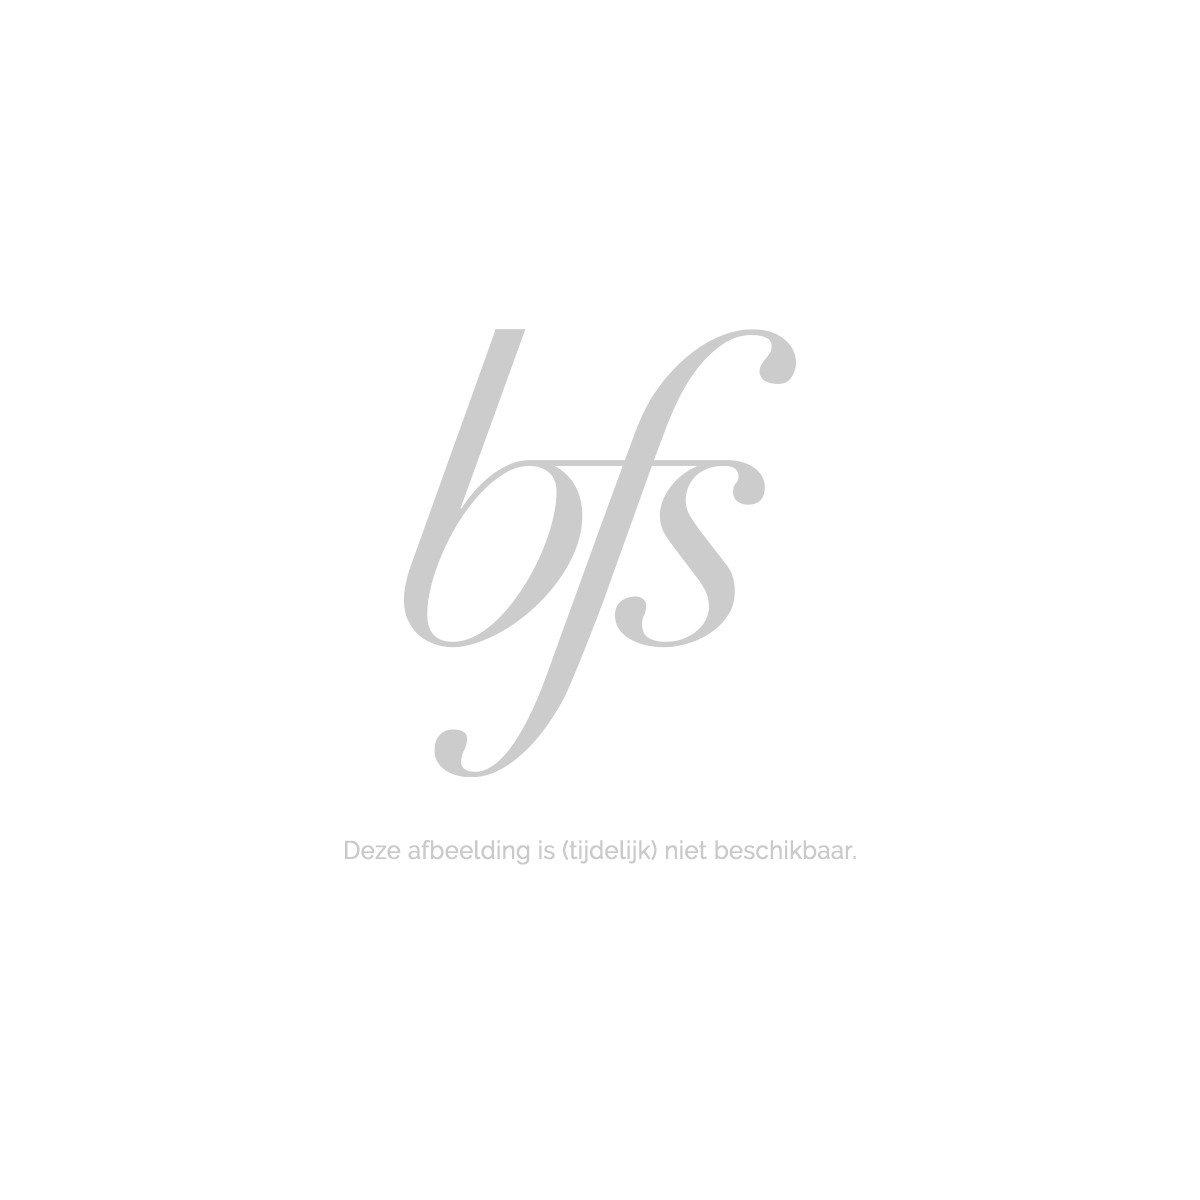 Banila Hello Sunny Hydrating Sun Essence Spf50+ Pa++++ 50 Ml